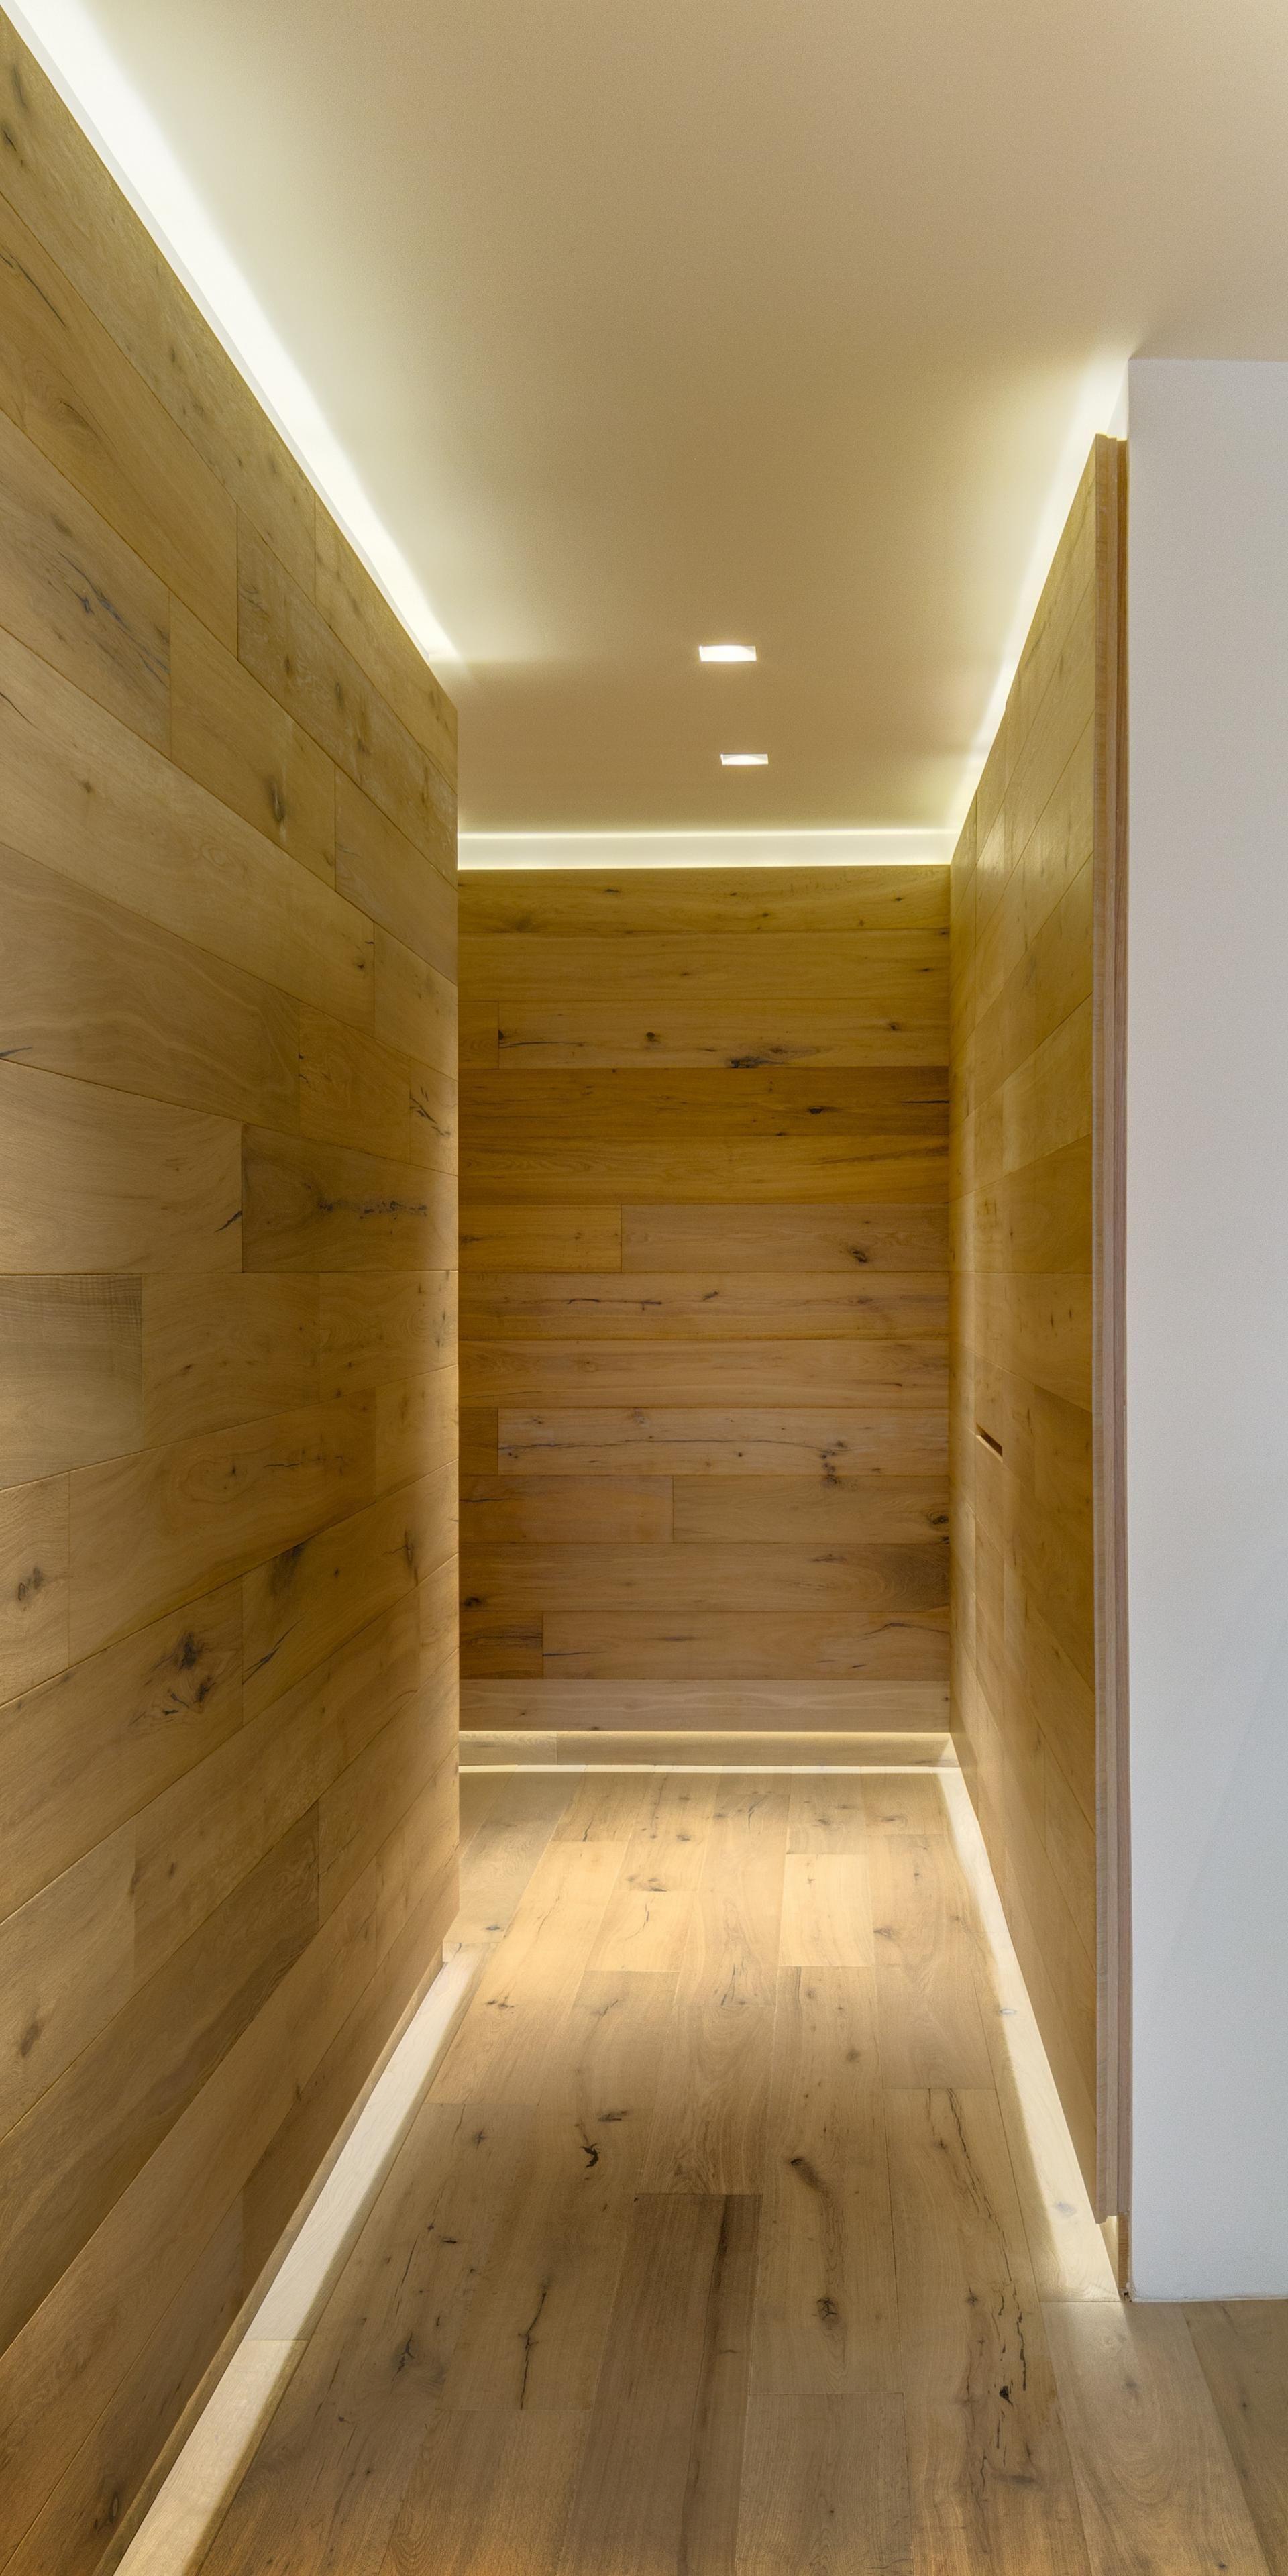 Rafael Gamo Penthouse Mexico by Archetonic Strip Lighting 9aaf8ad3cd